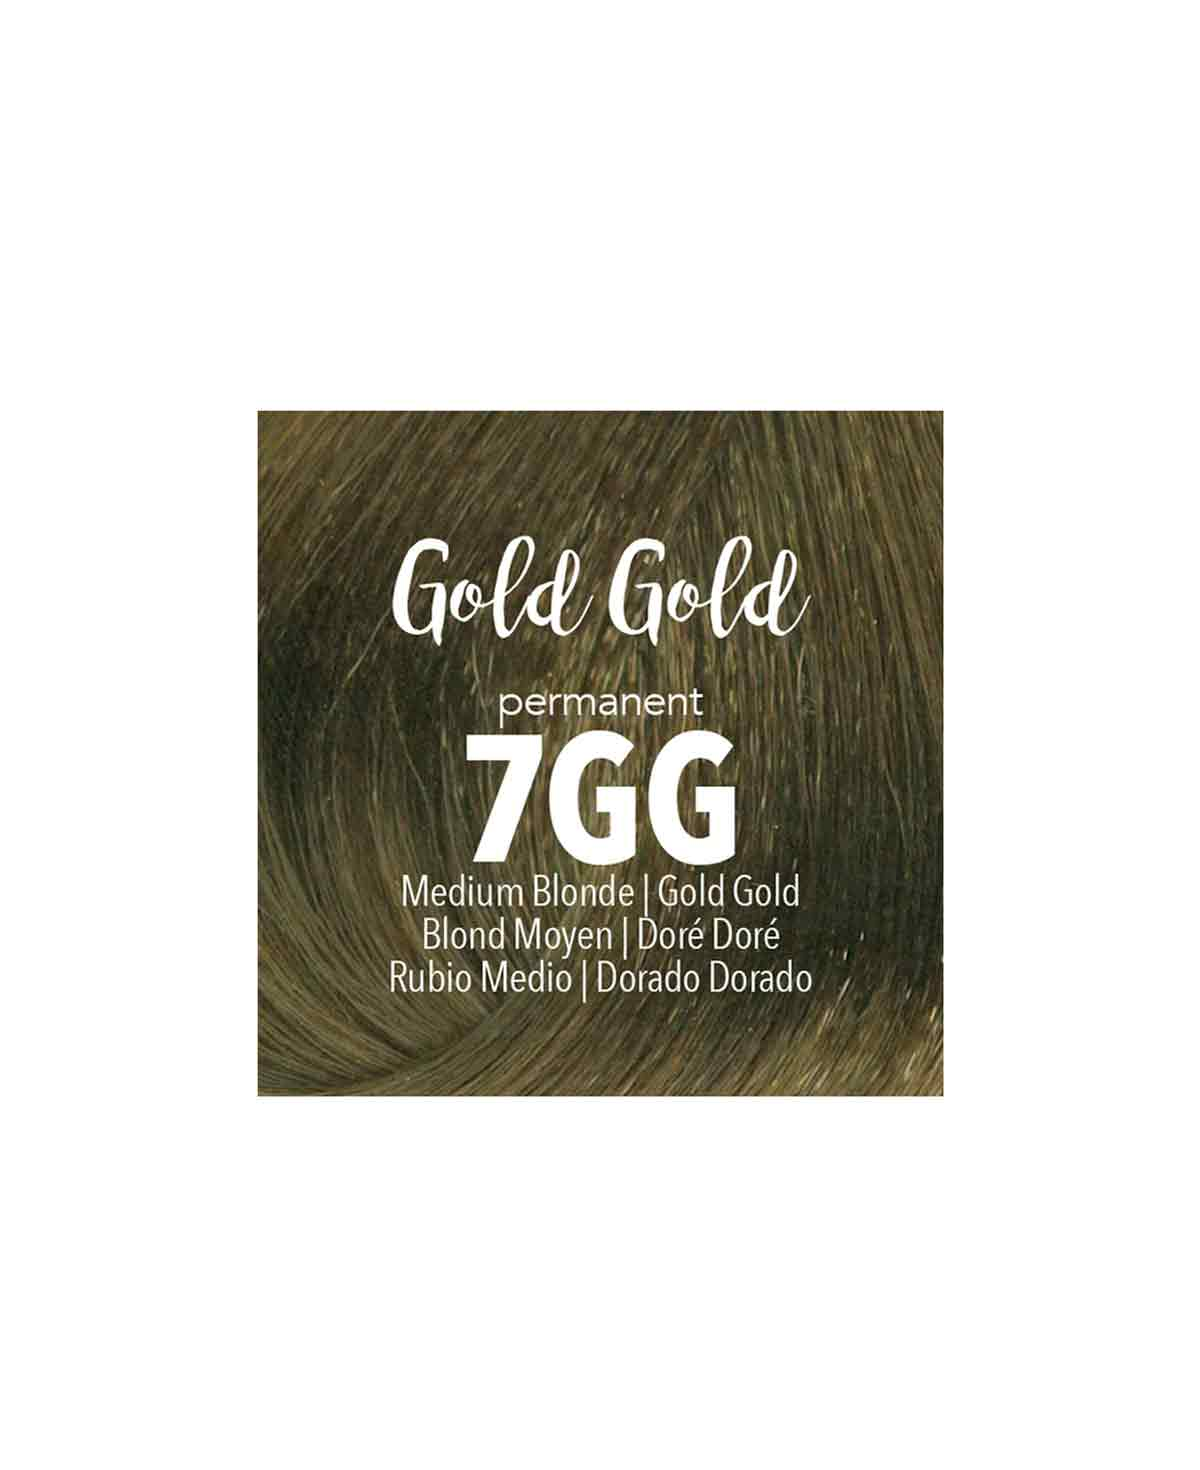 Mydentity - 7GG Medium Blonde Gold Gold